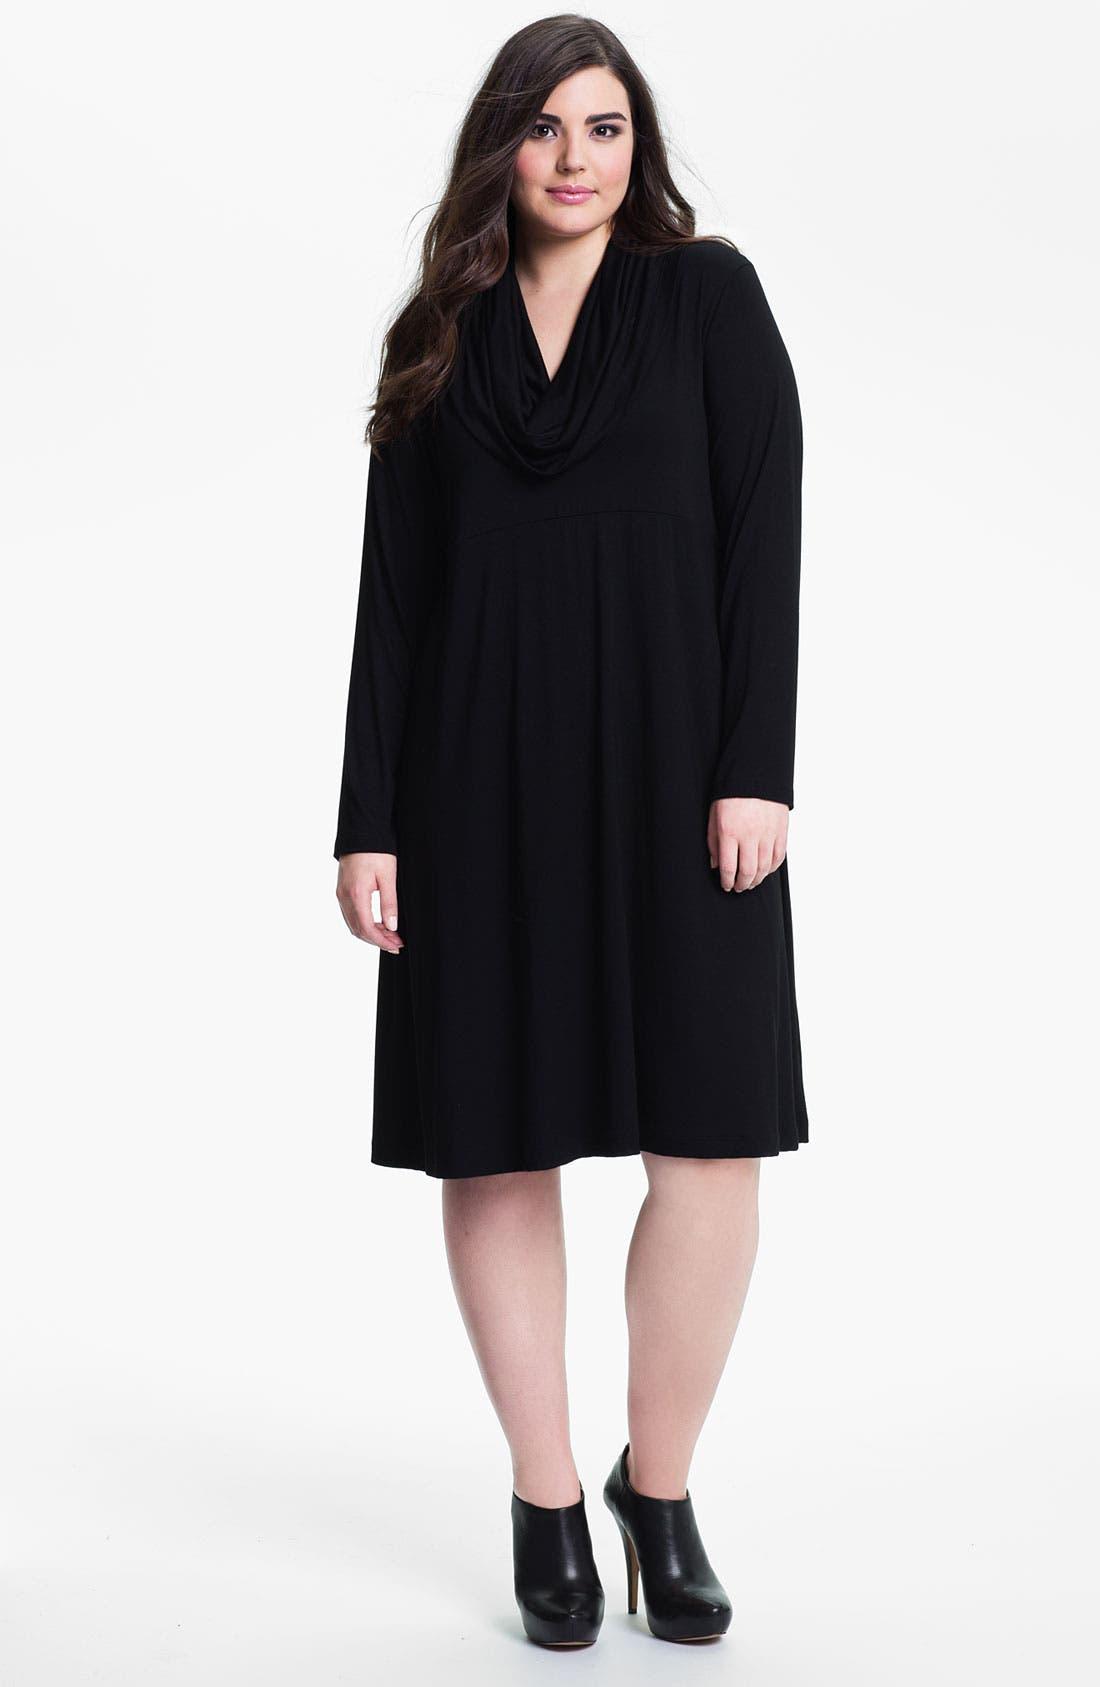 Alternate Image 1 Selected - Karen Kane Drape Neck Knit Dress (Plus)